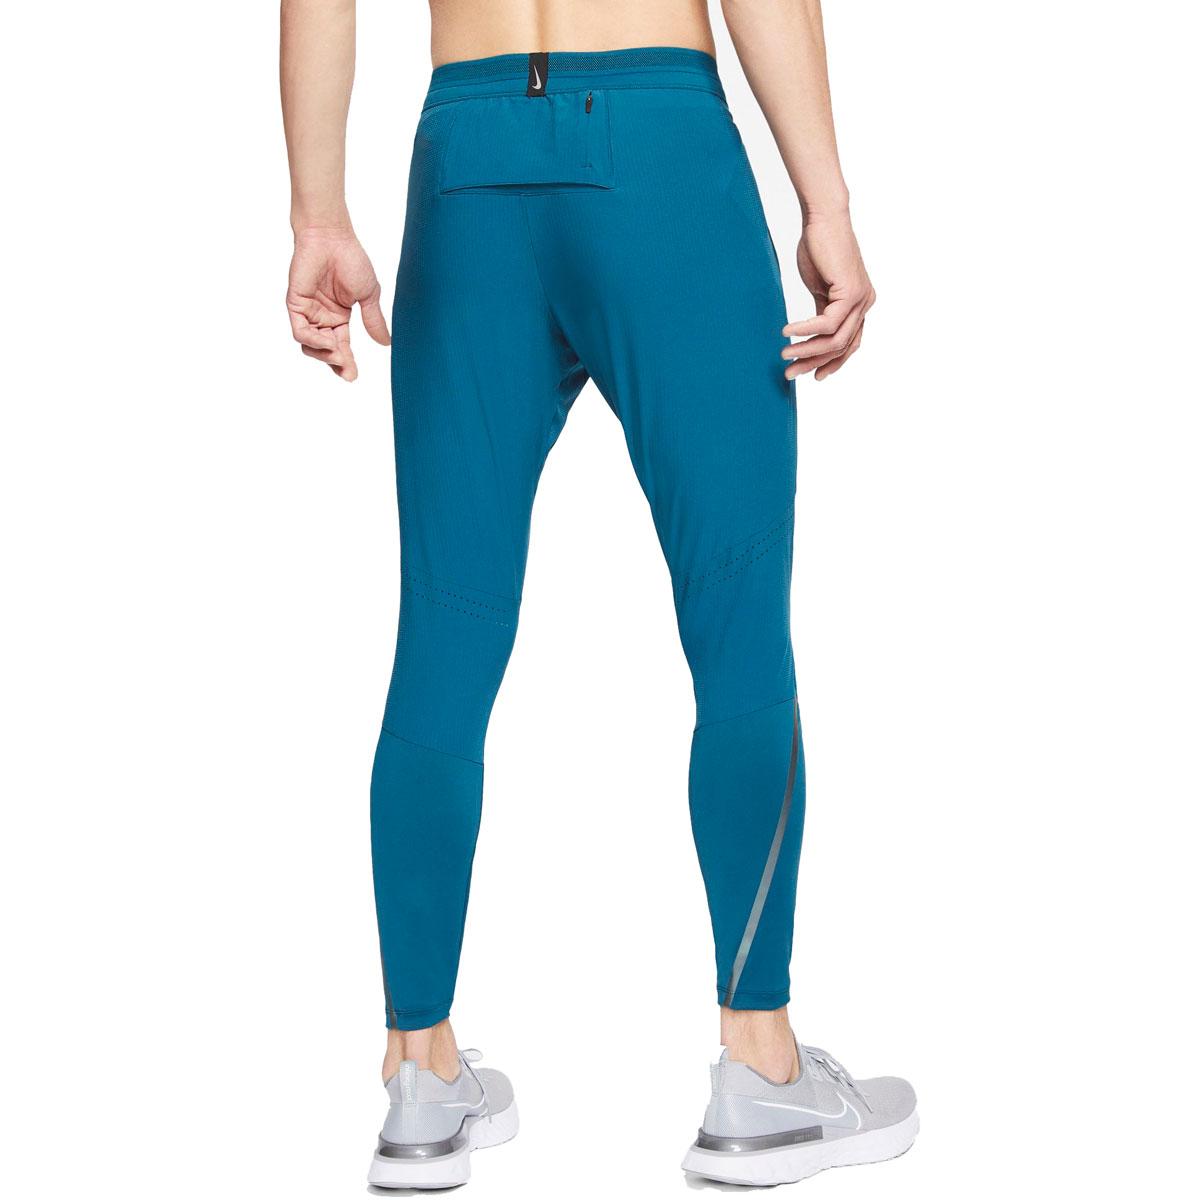 Men's Nike Swift Running Pants - Color: Valerian Blue/Reflect Black - Size: S, Valerian Blue/Reflect Black, large, image 2